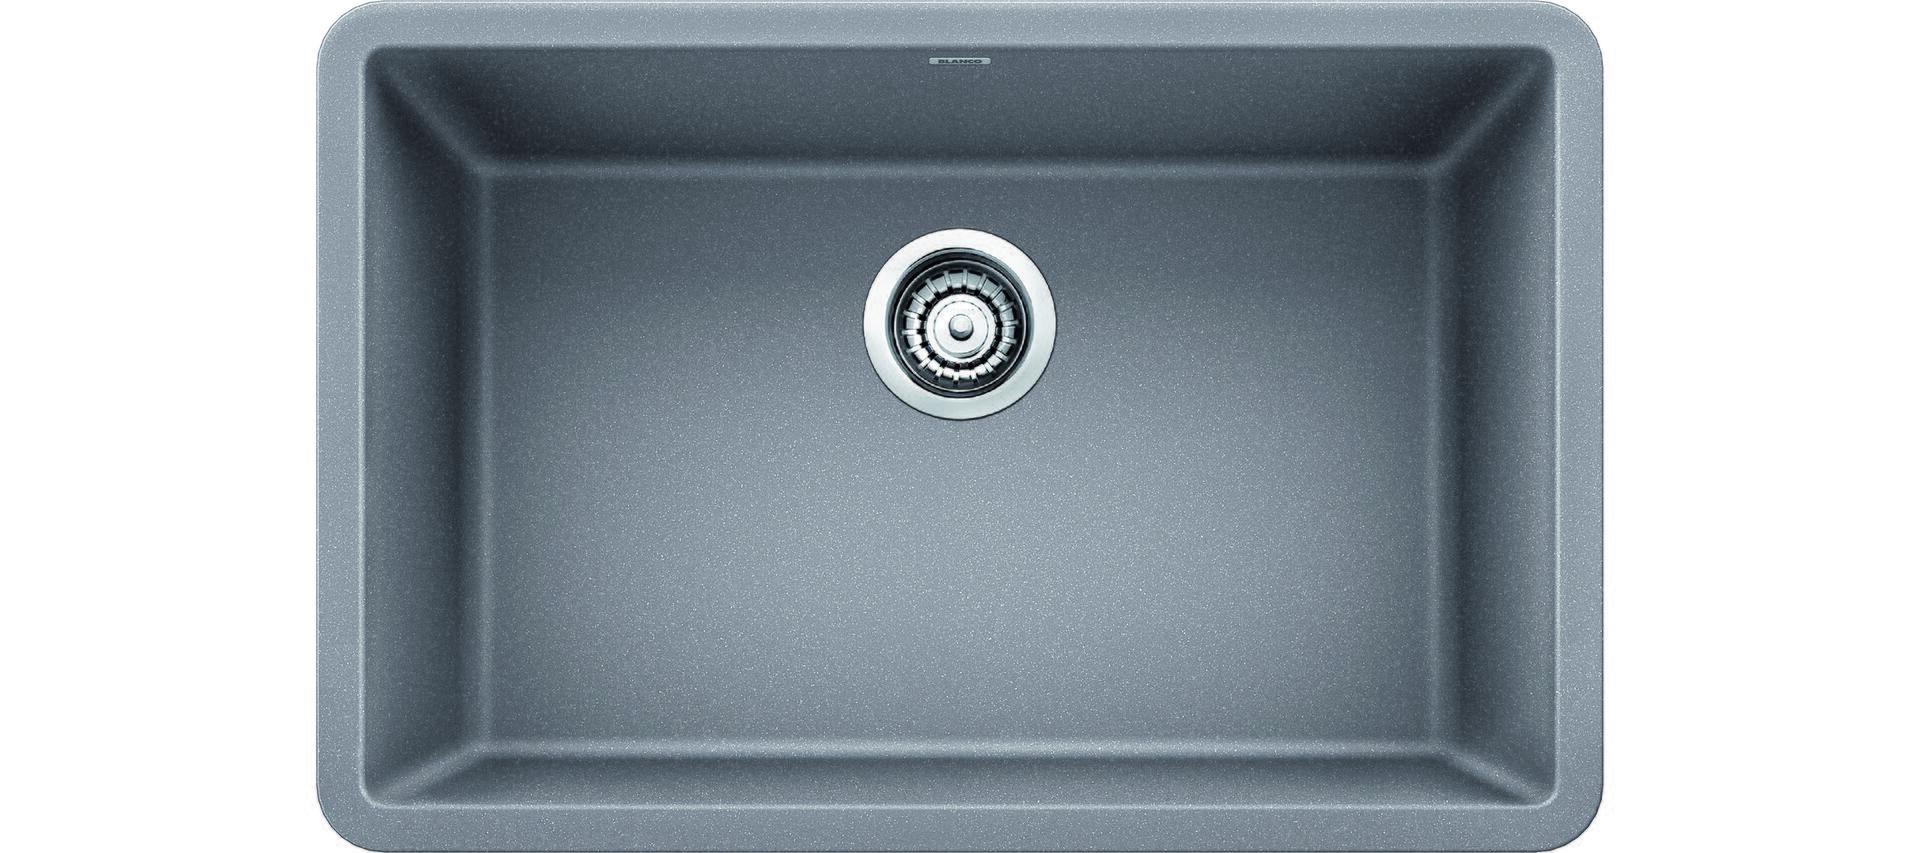 Blanco 522428 Sink | Appliances Connection